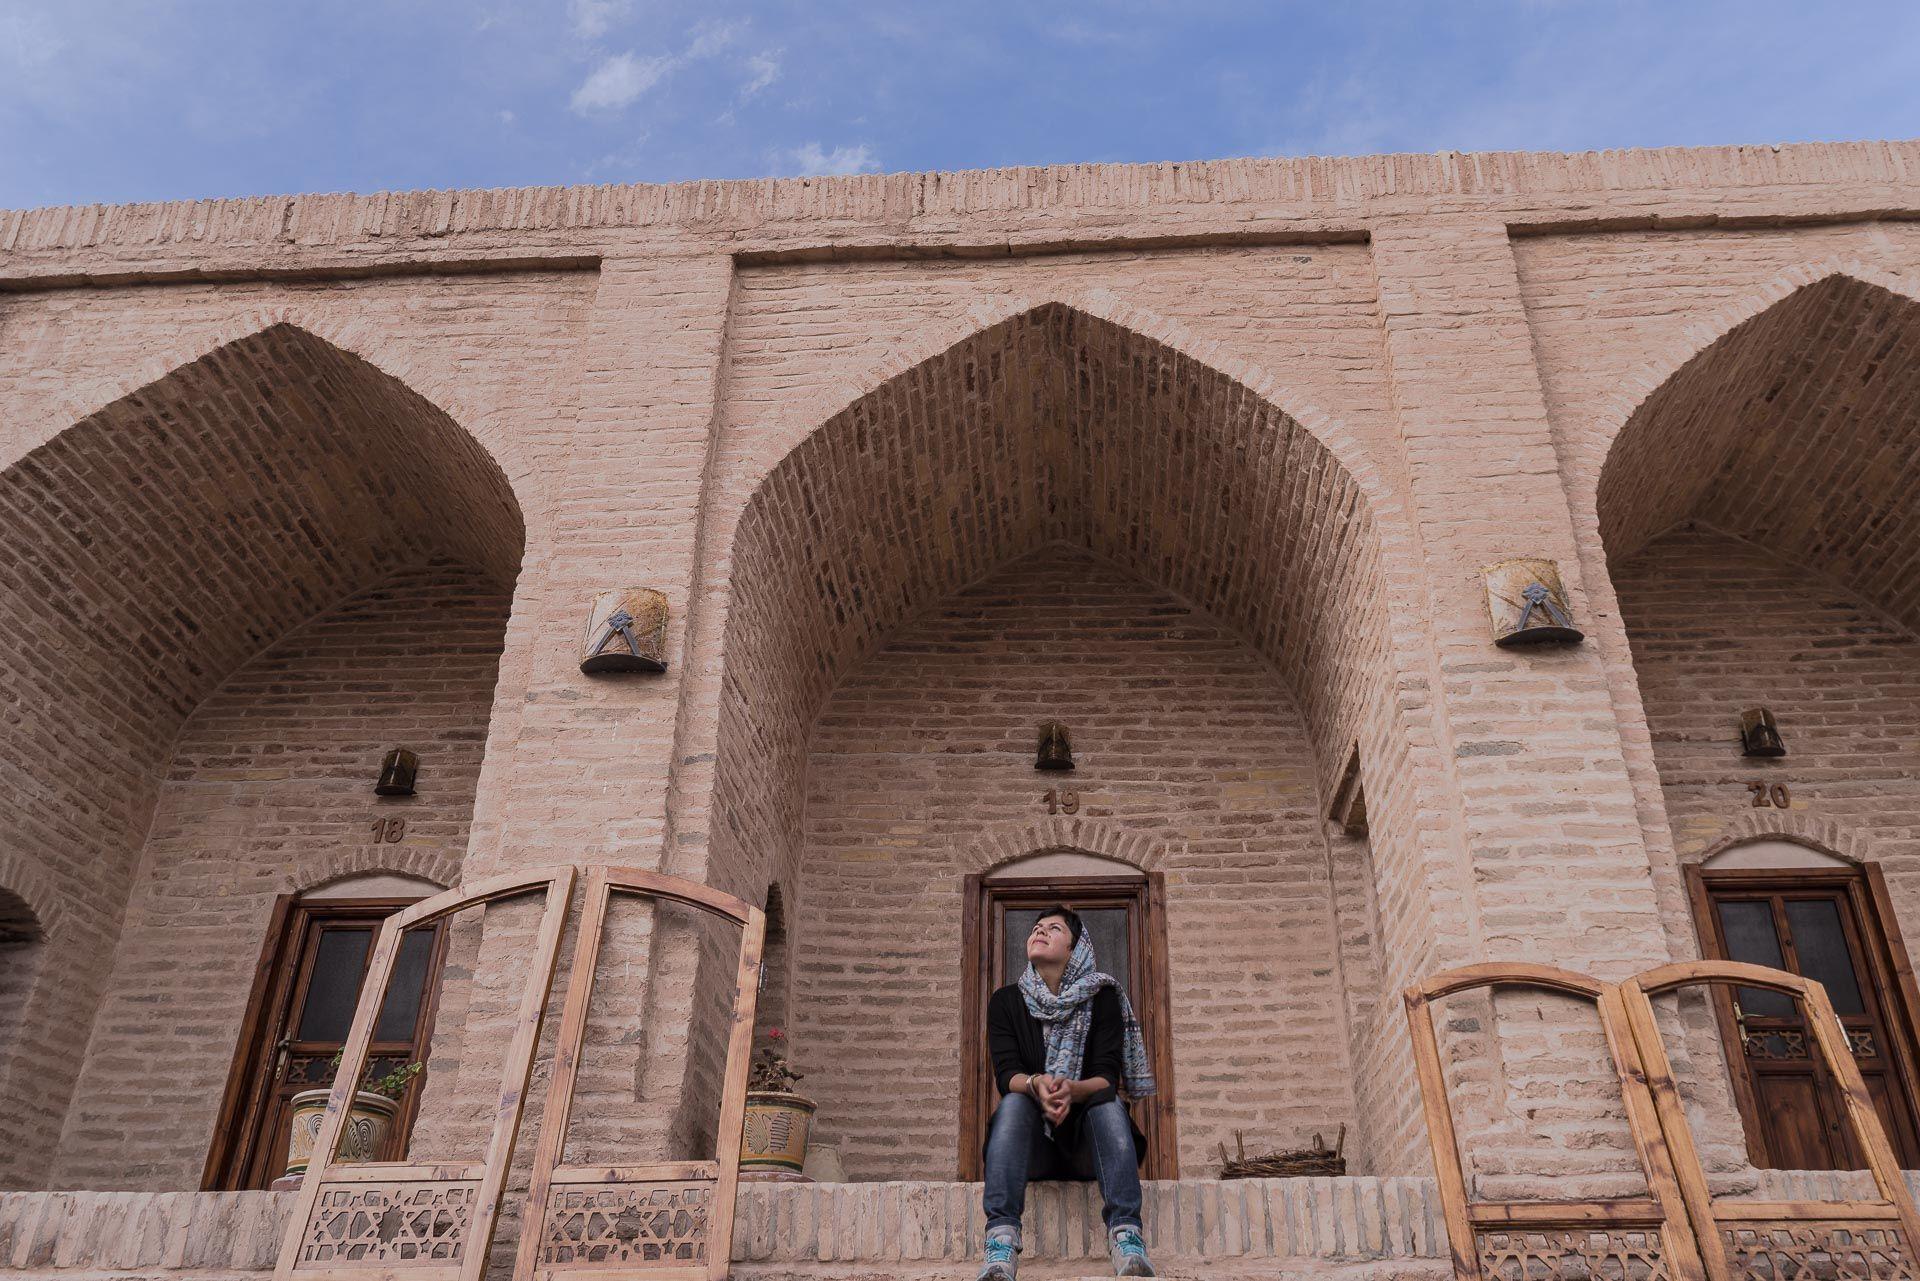 Lesvoyageuses-Iran-Desert-Central-Caravanserail-Kuhpa-14